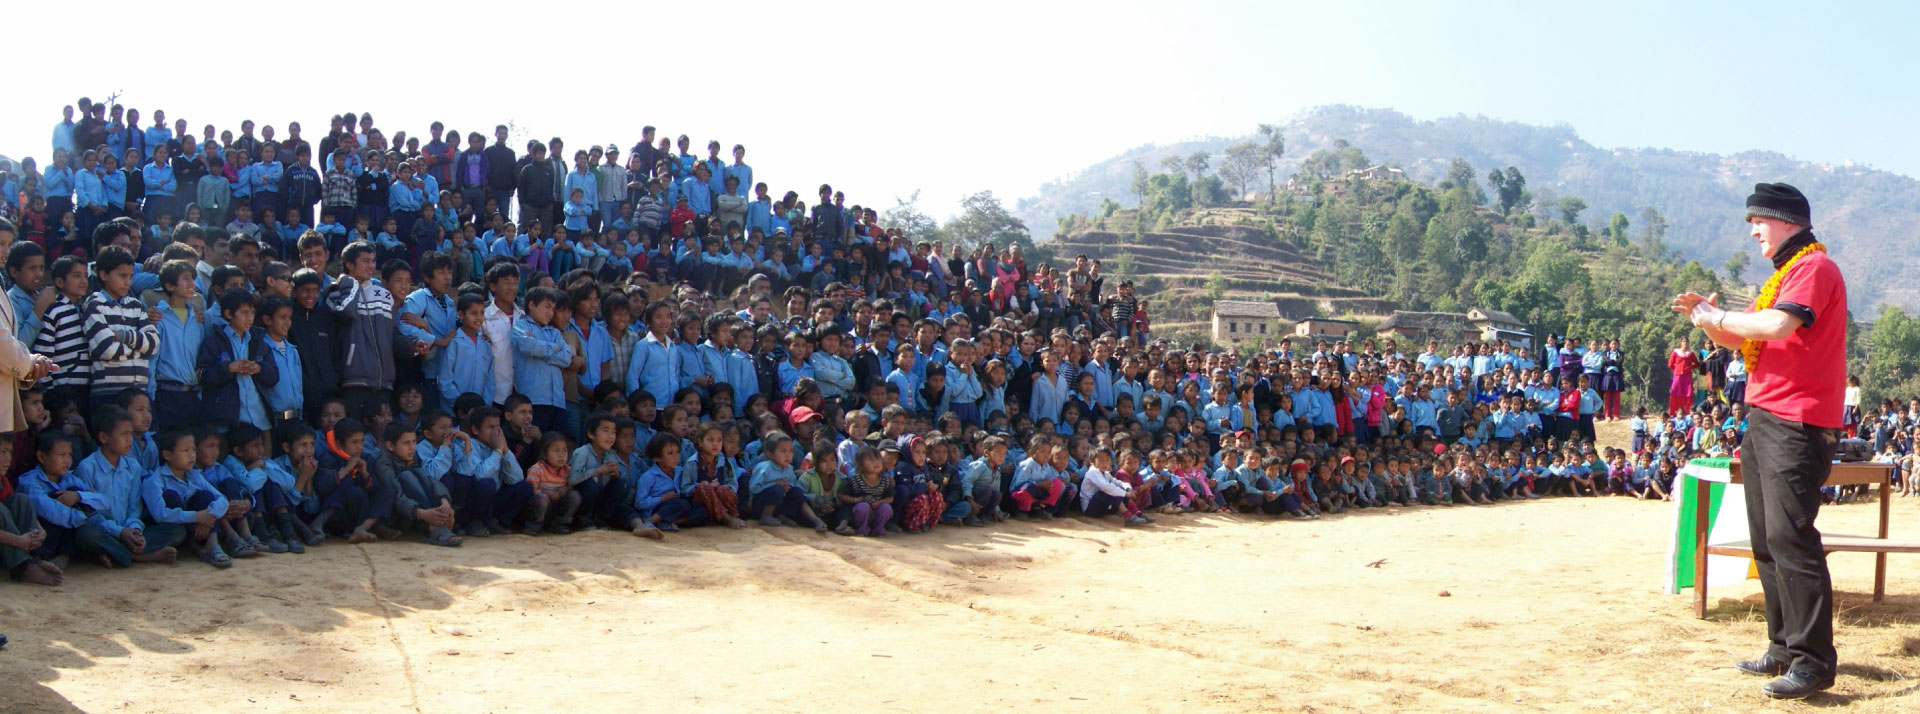 Nagarhope SponsorKidz Programme